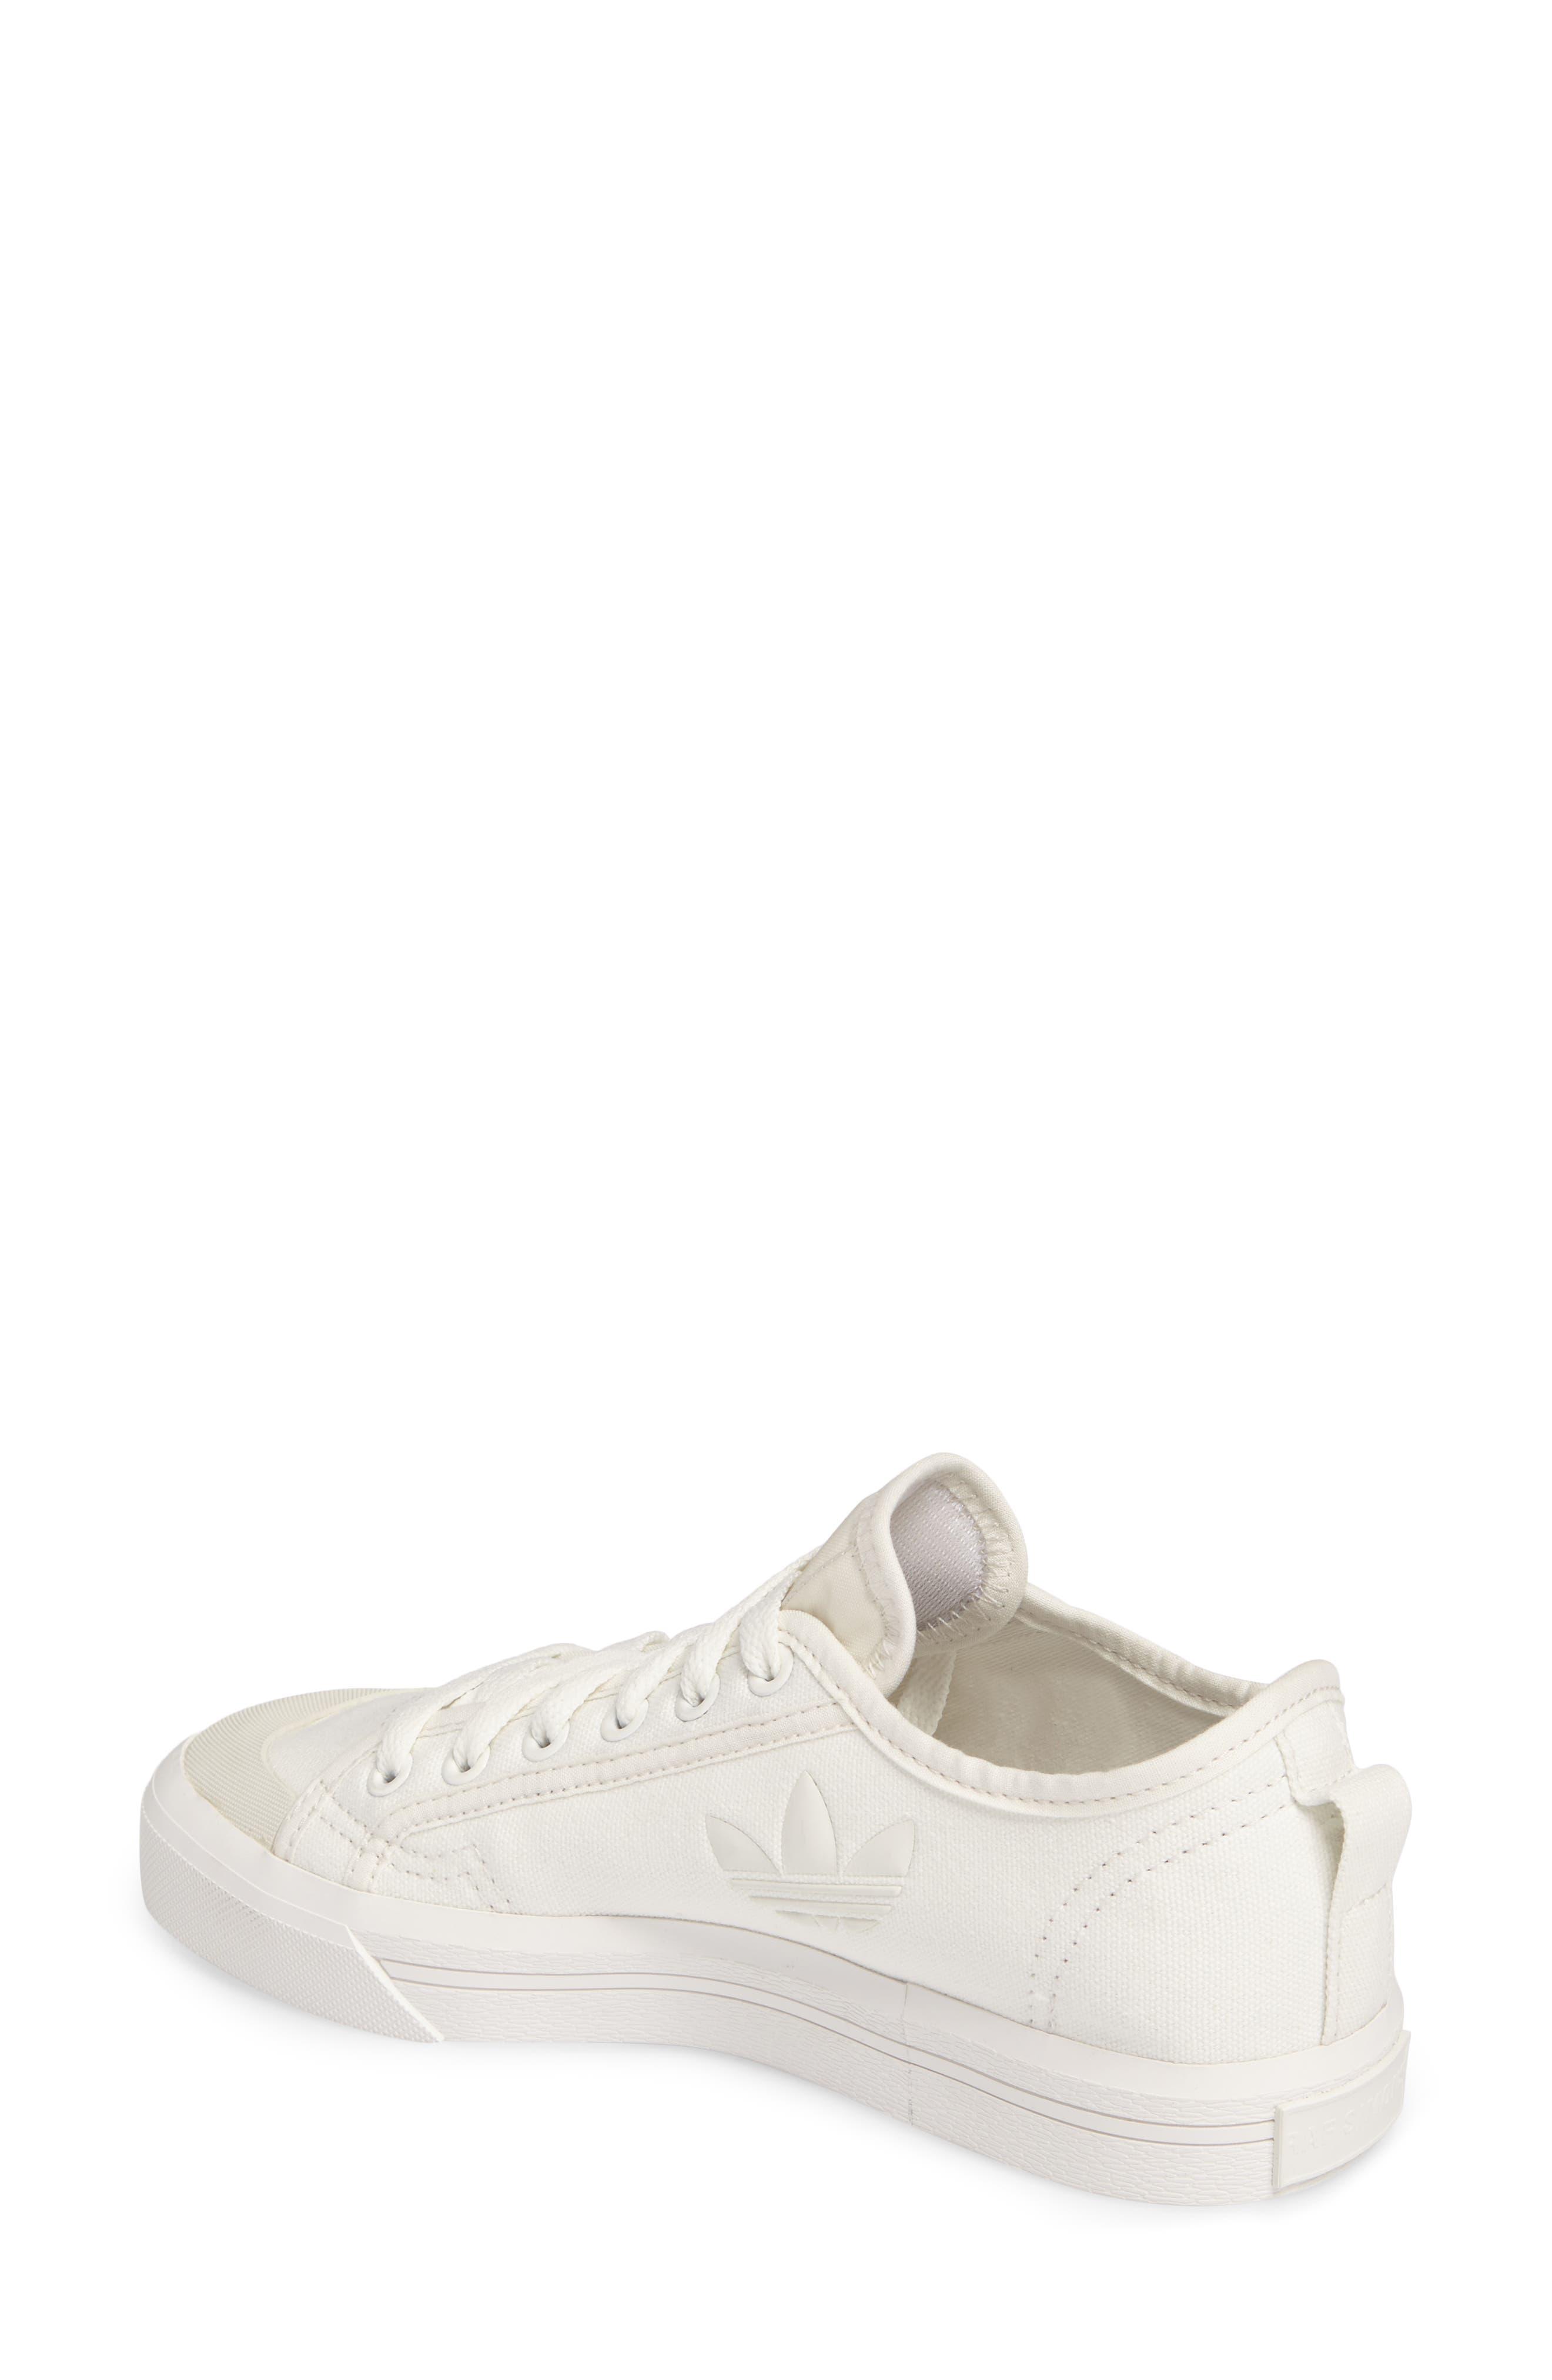 adidas by Raf Simons Spirit Low Top Sneaker,                             Alternate thumbnail 2, color,                             Optic White